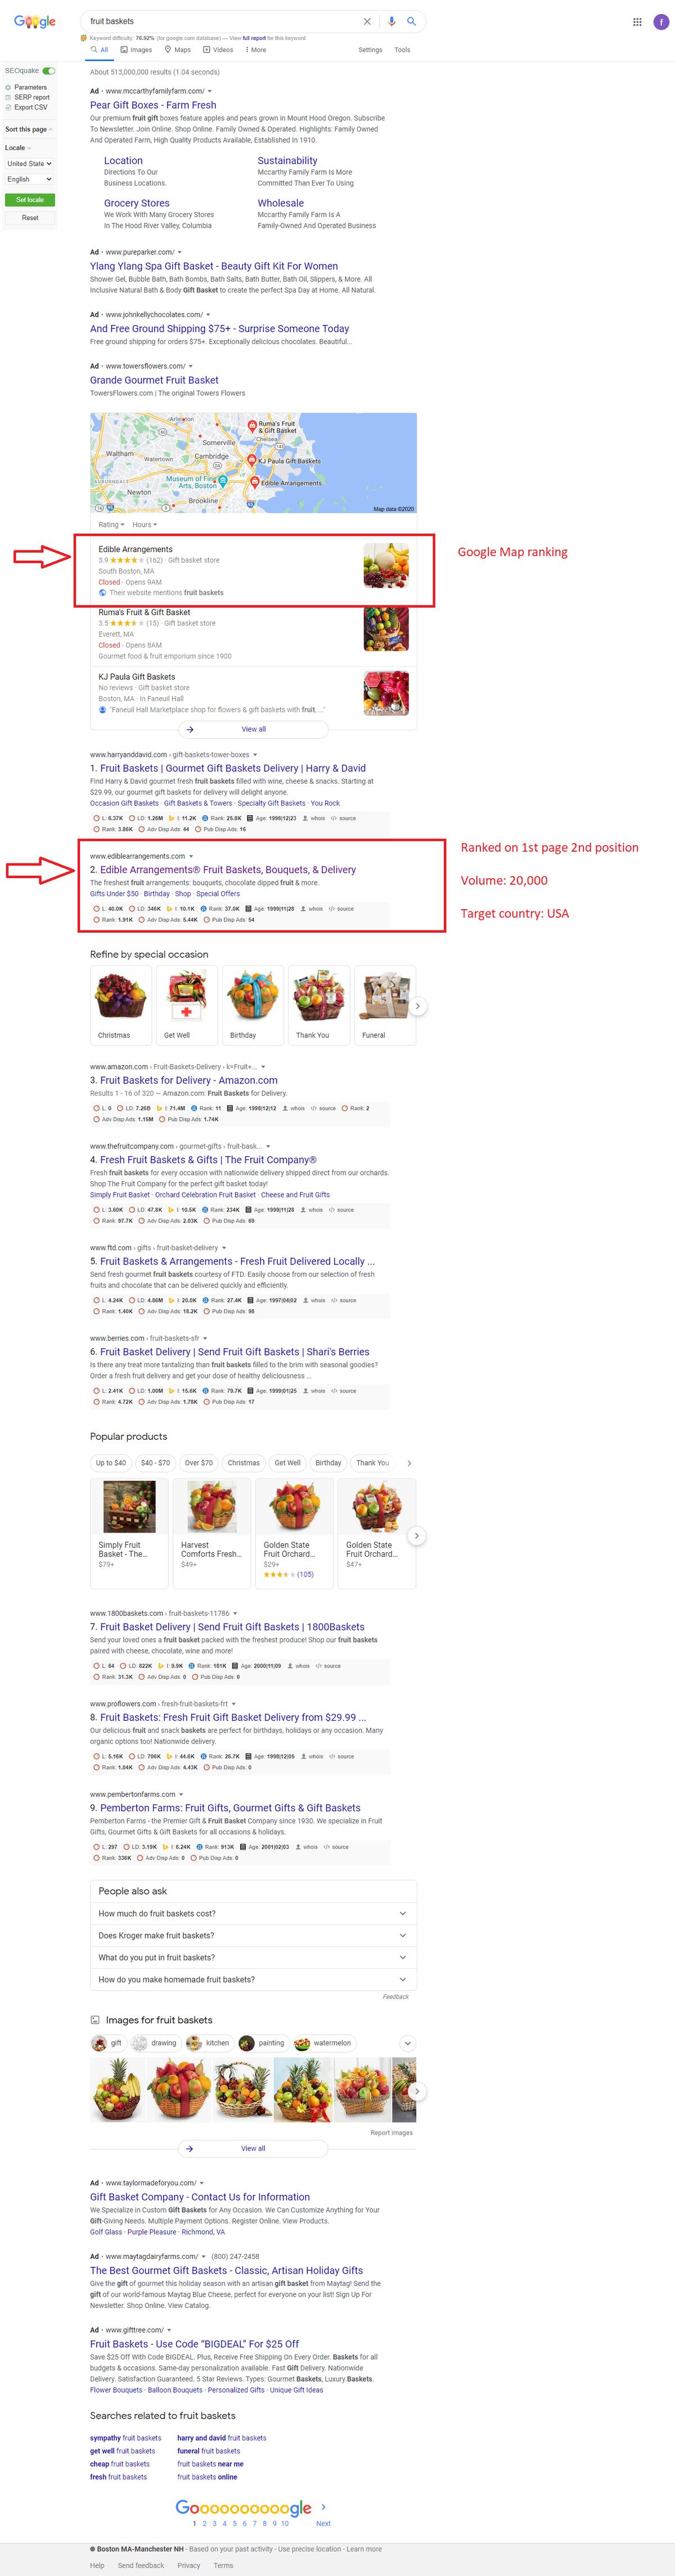 SEO Project-Fruit Baskets